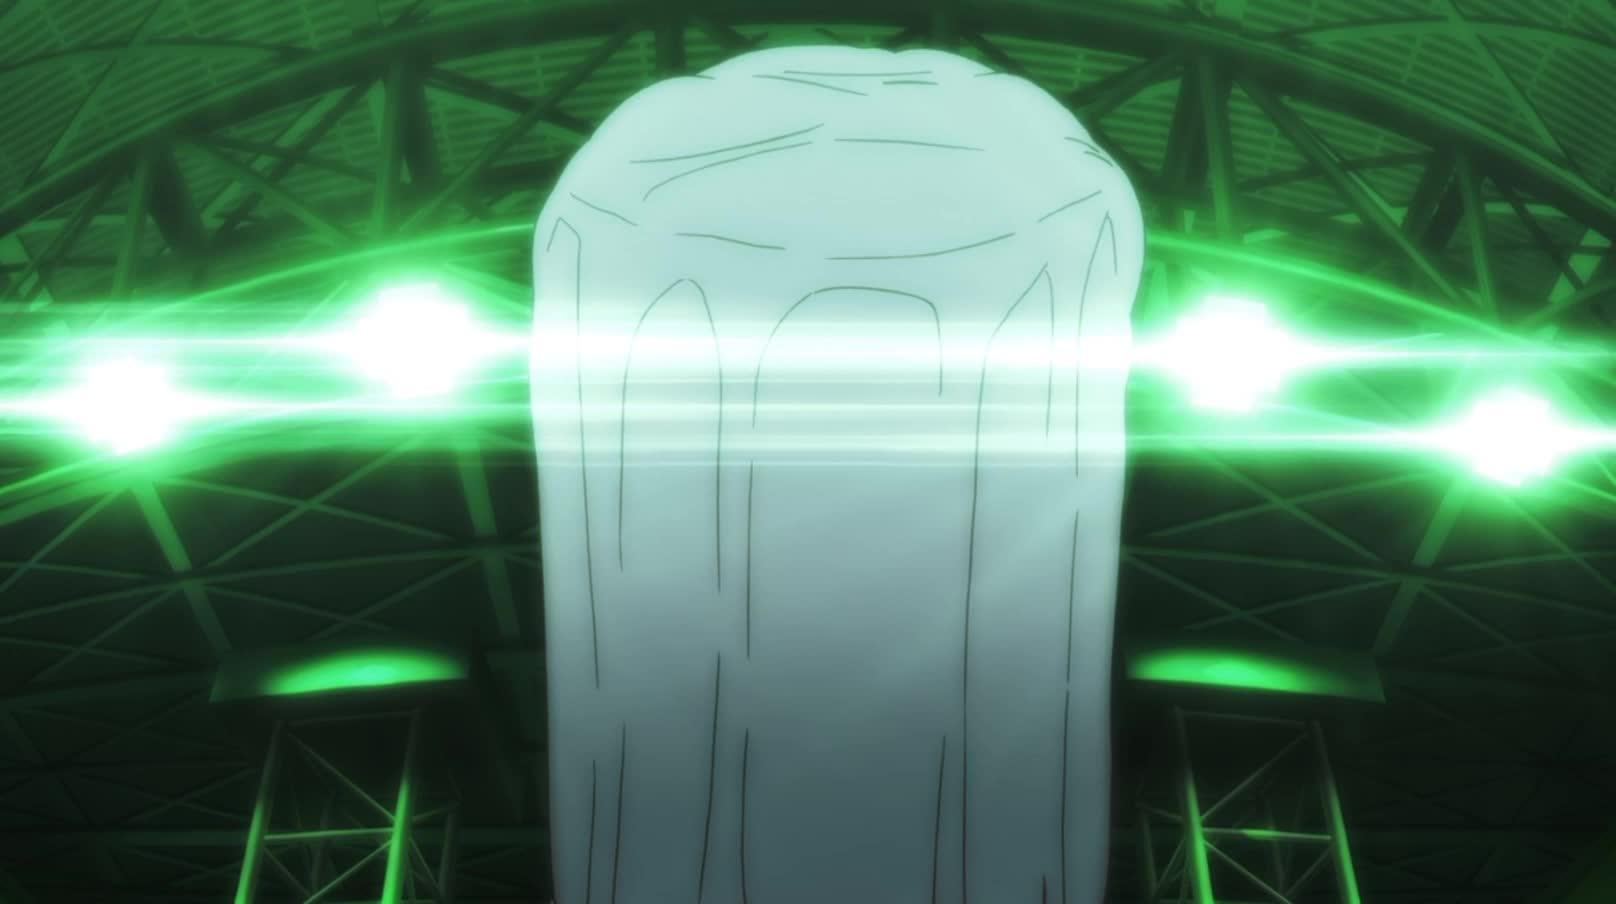 Nisekoi S01E01 (2) GIFs